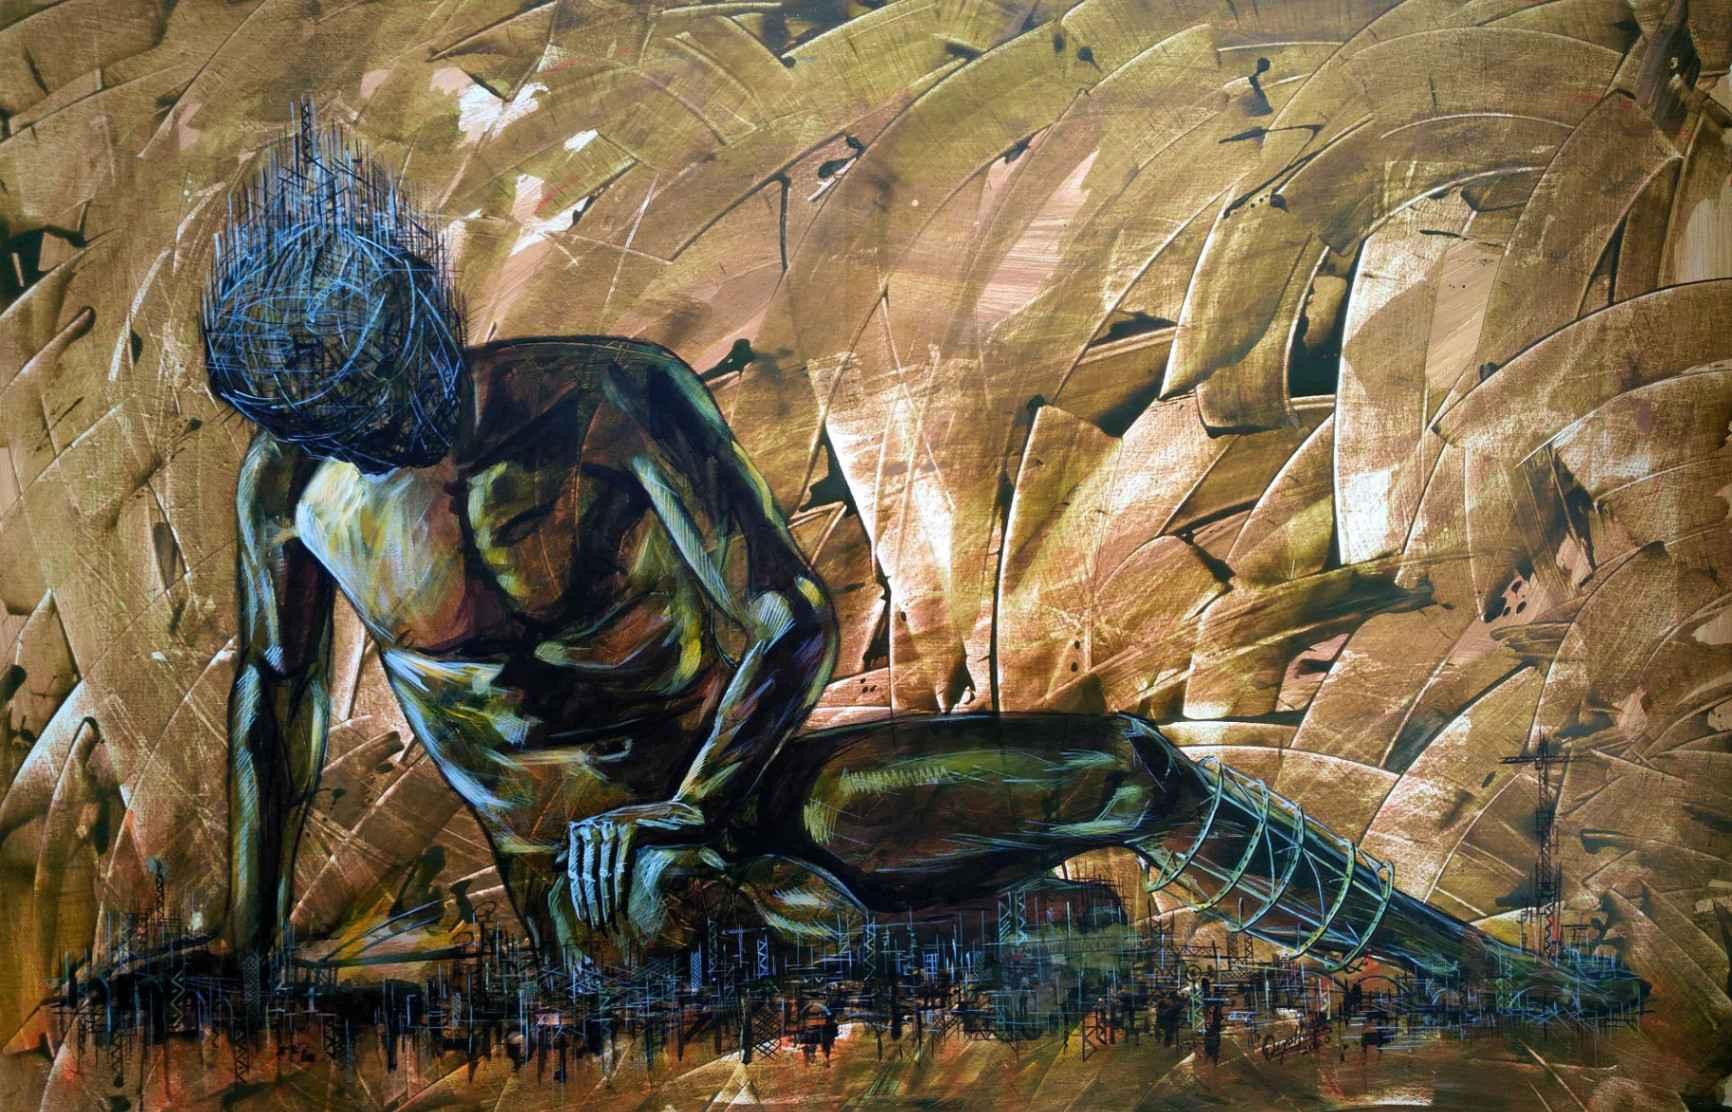 Obra: A caída Da Serie O corpo da cidade